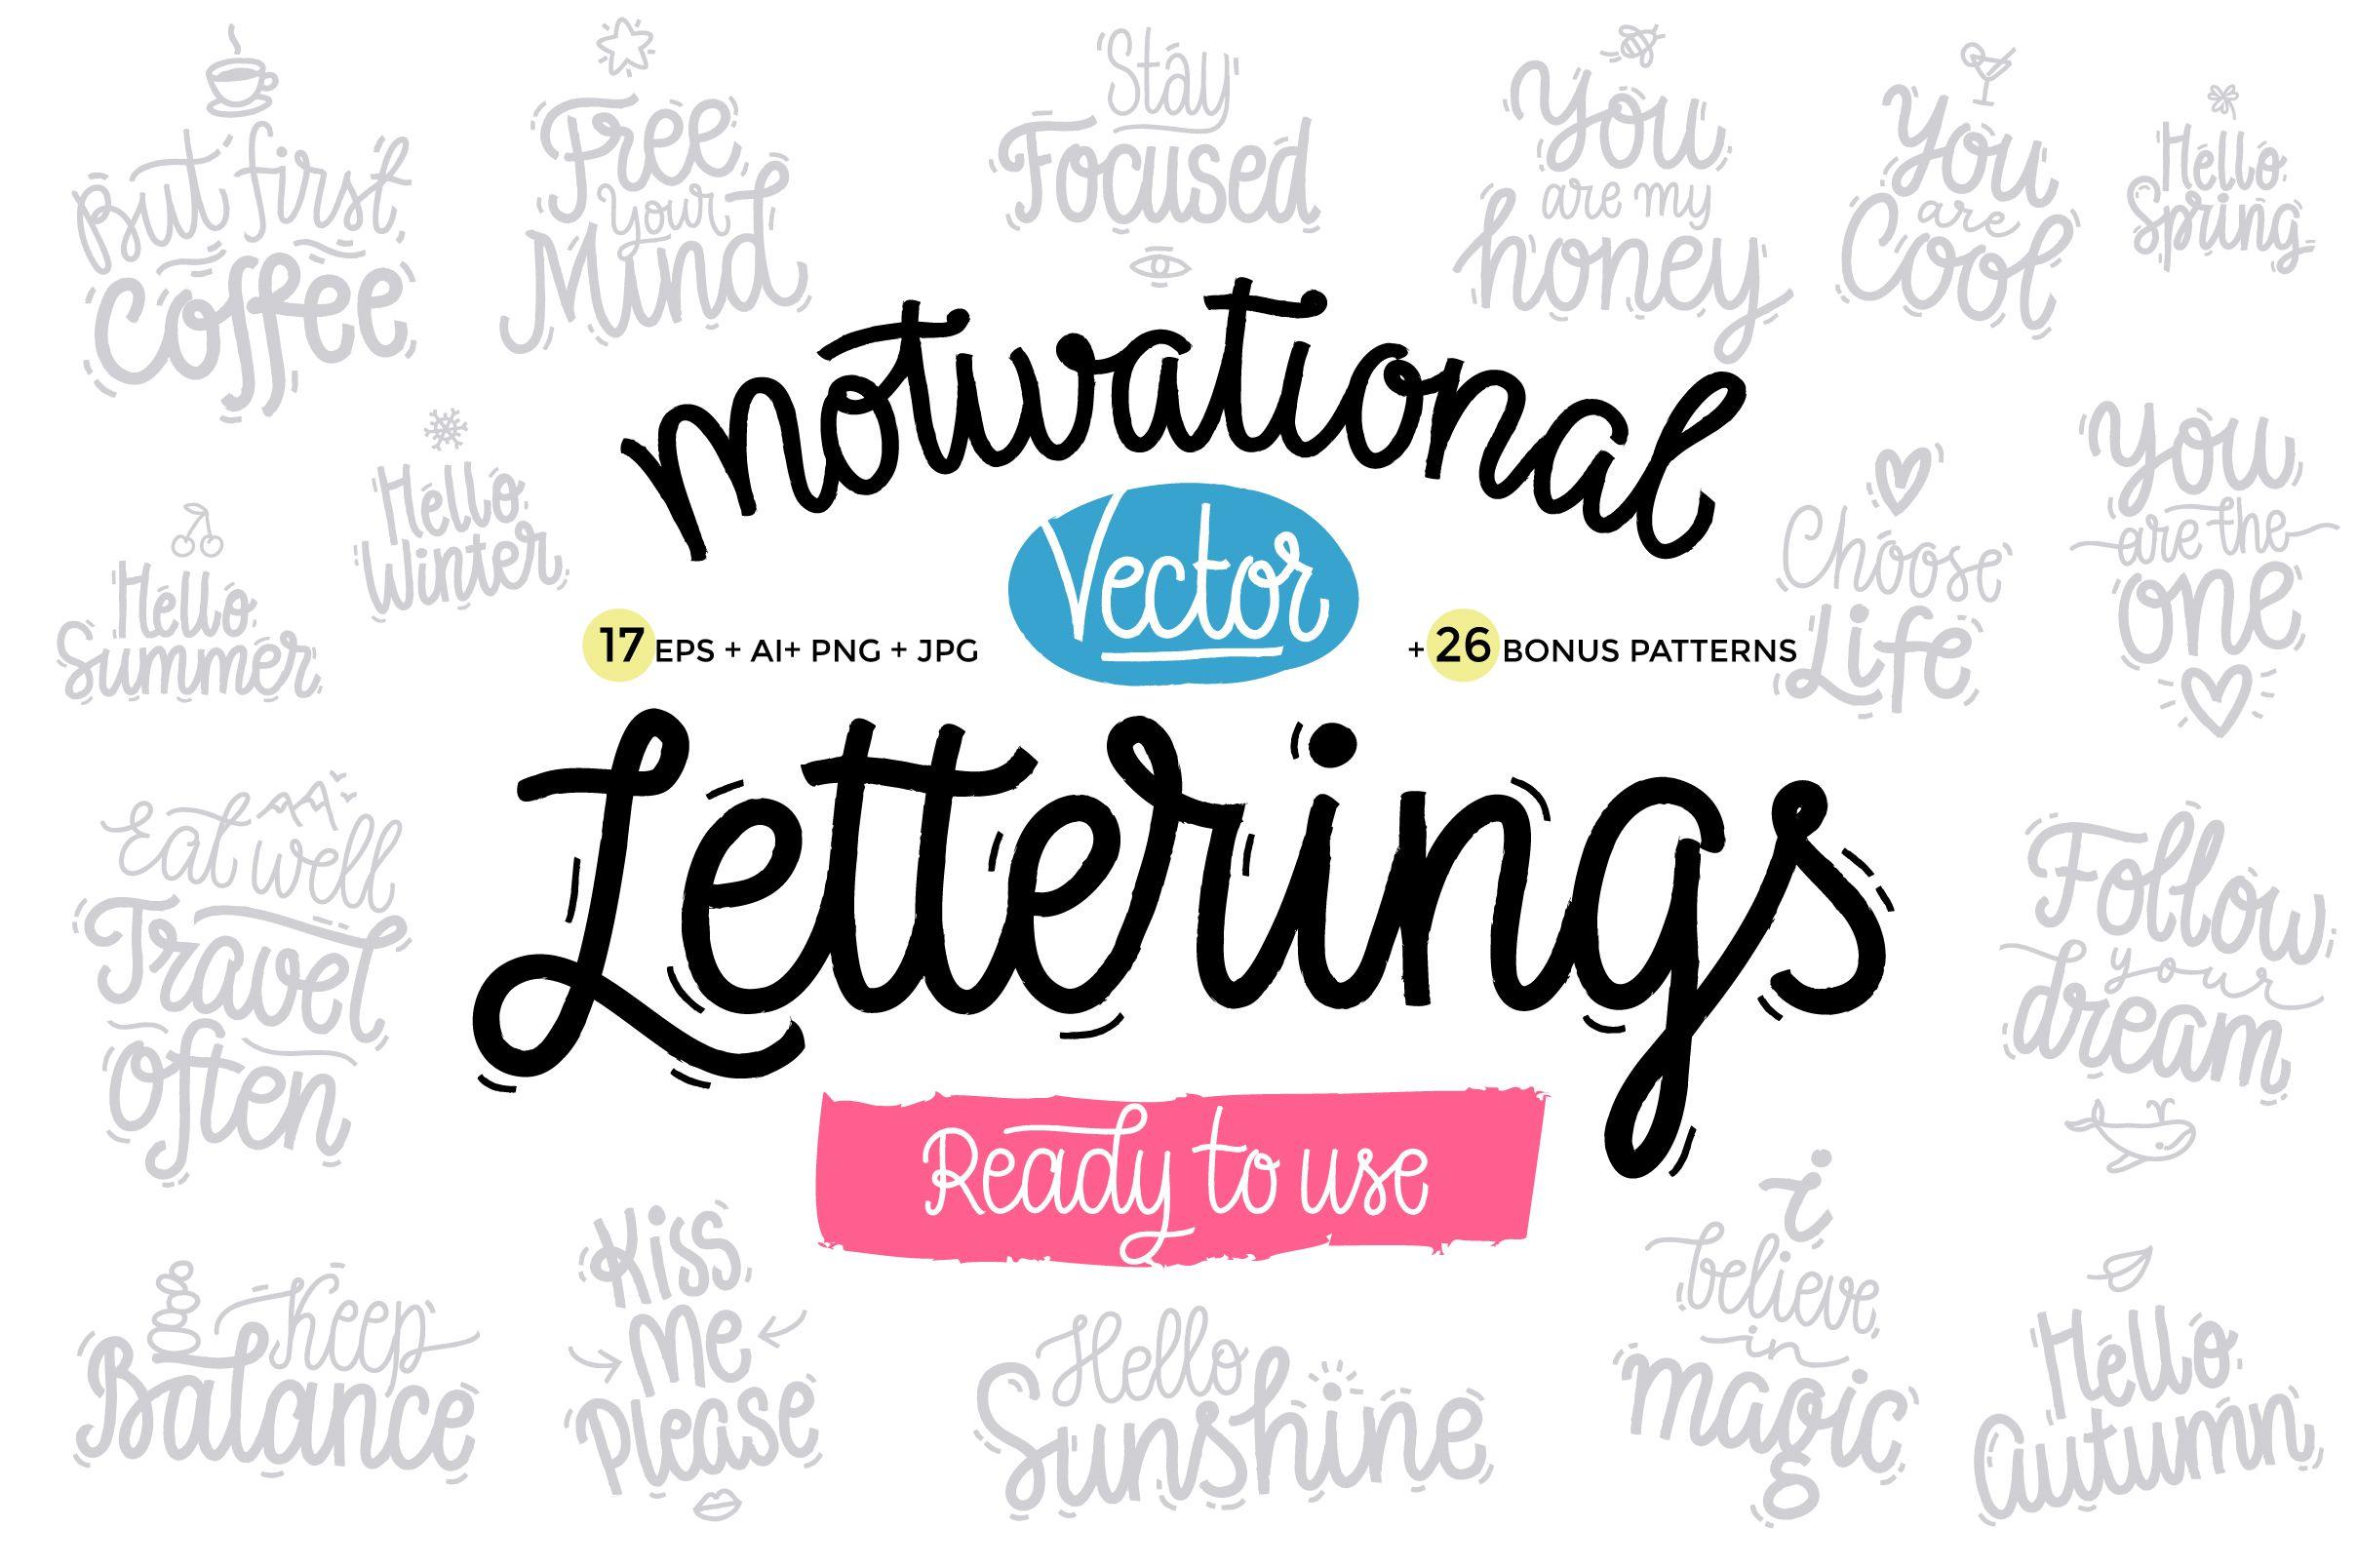 Motivational vector letterings by zira zulu on creativemarket